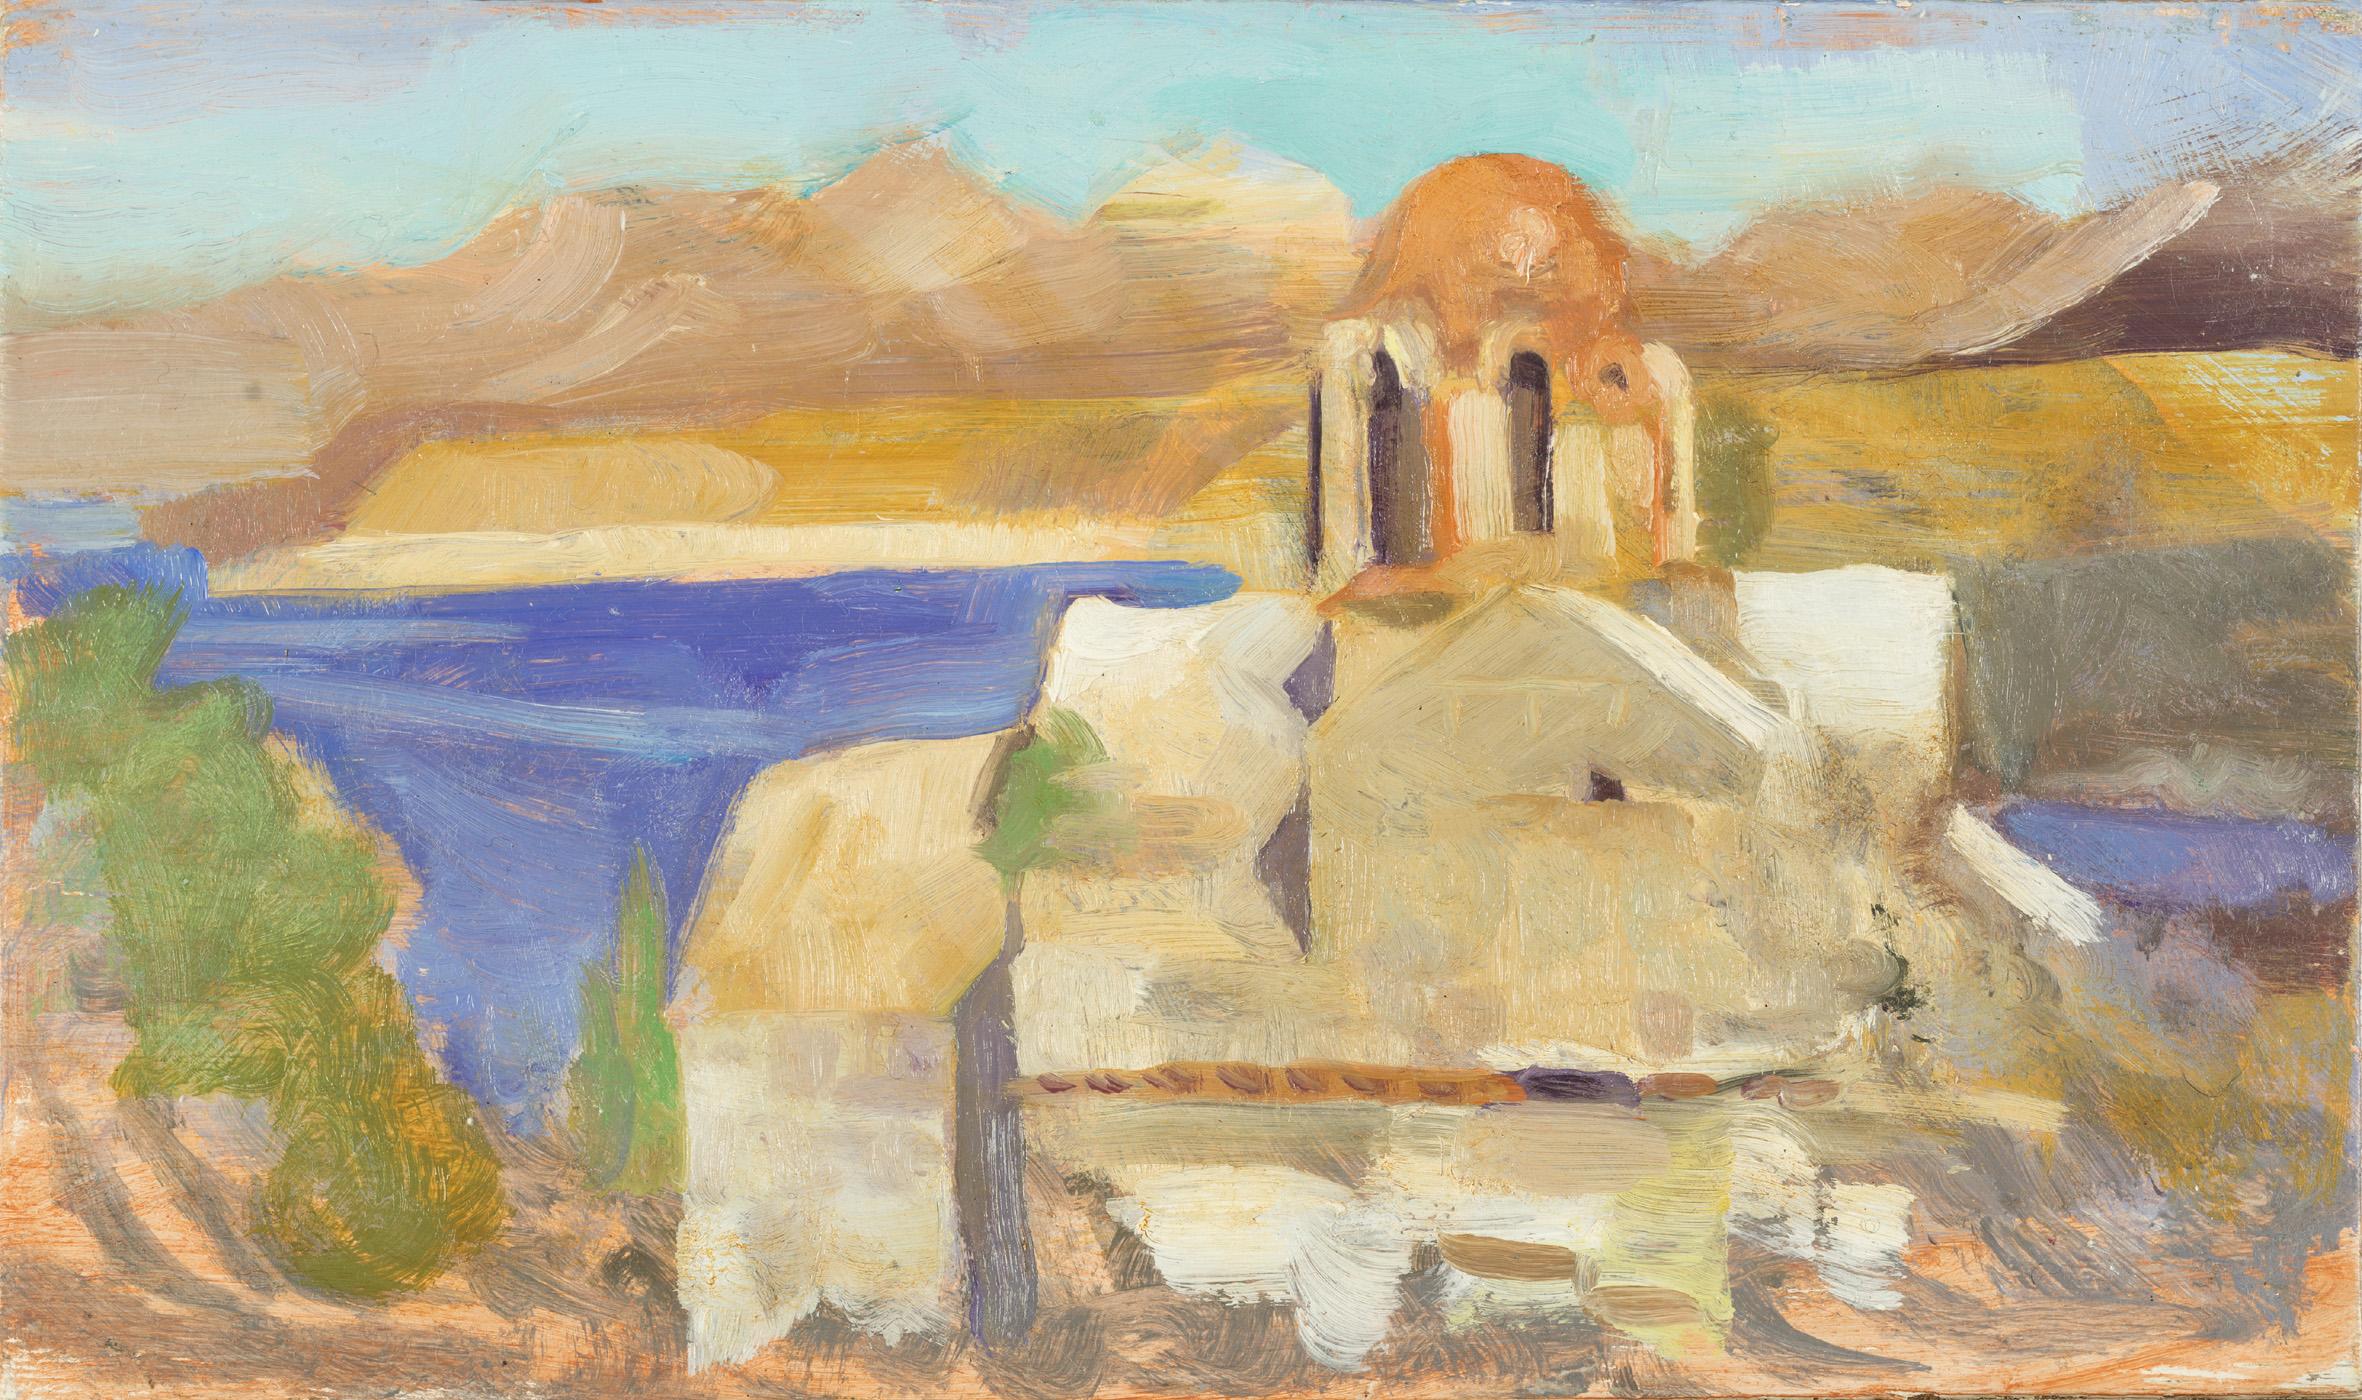 'Midday sun: study for the Poets church - Vlacherna, Bay of Mezapos' oil on board 15.2 x 25.5cm